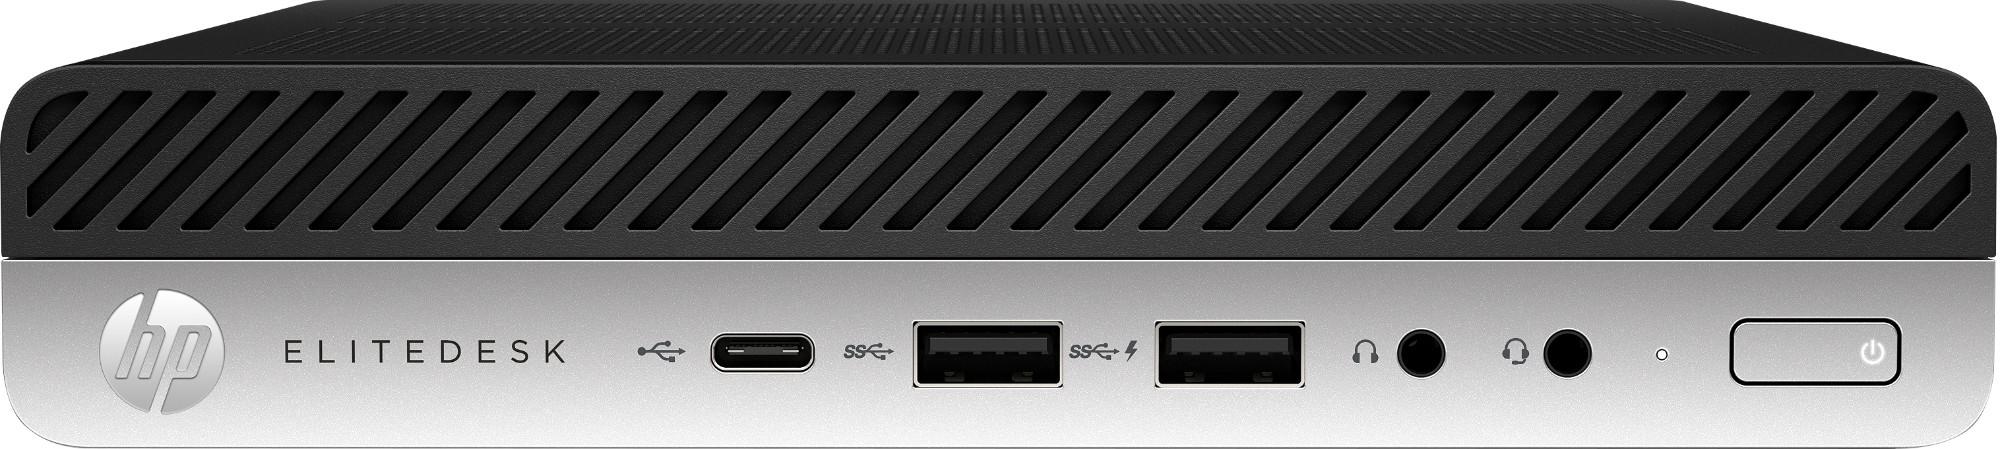 EliteDesk 800 G4 Desktop Mini PC - i7 8700 - 8GB RAM - 256GB SSD - Win10 Pro